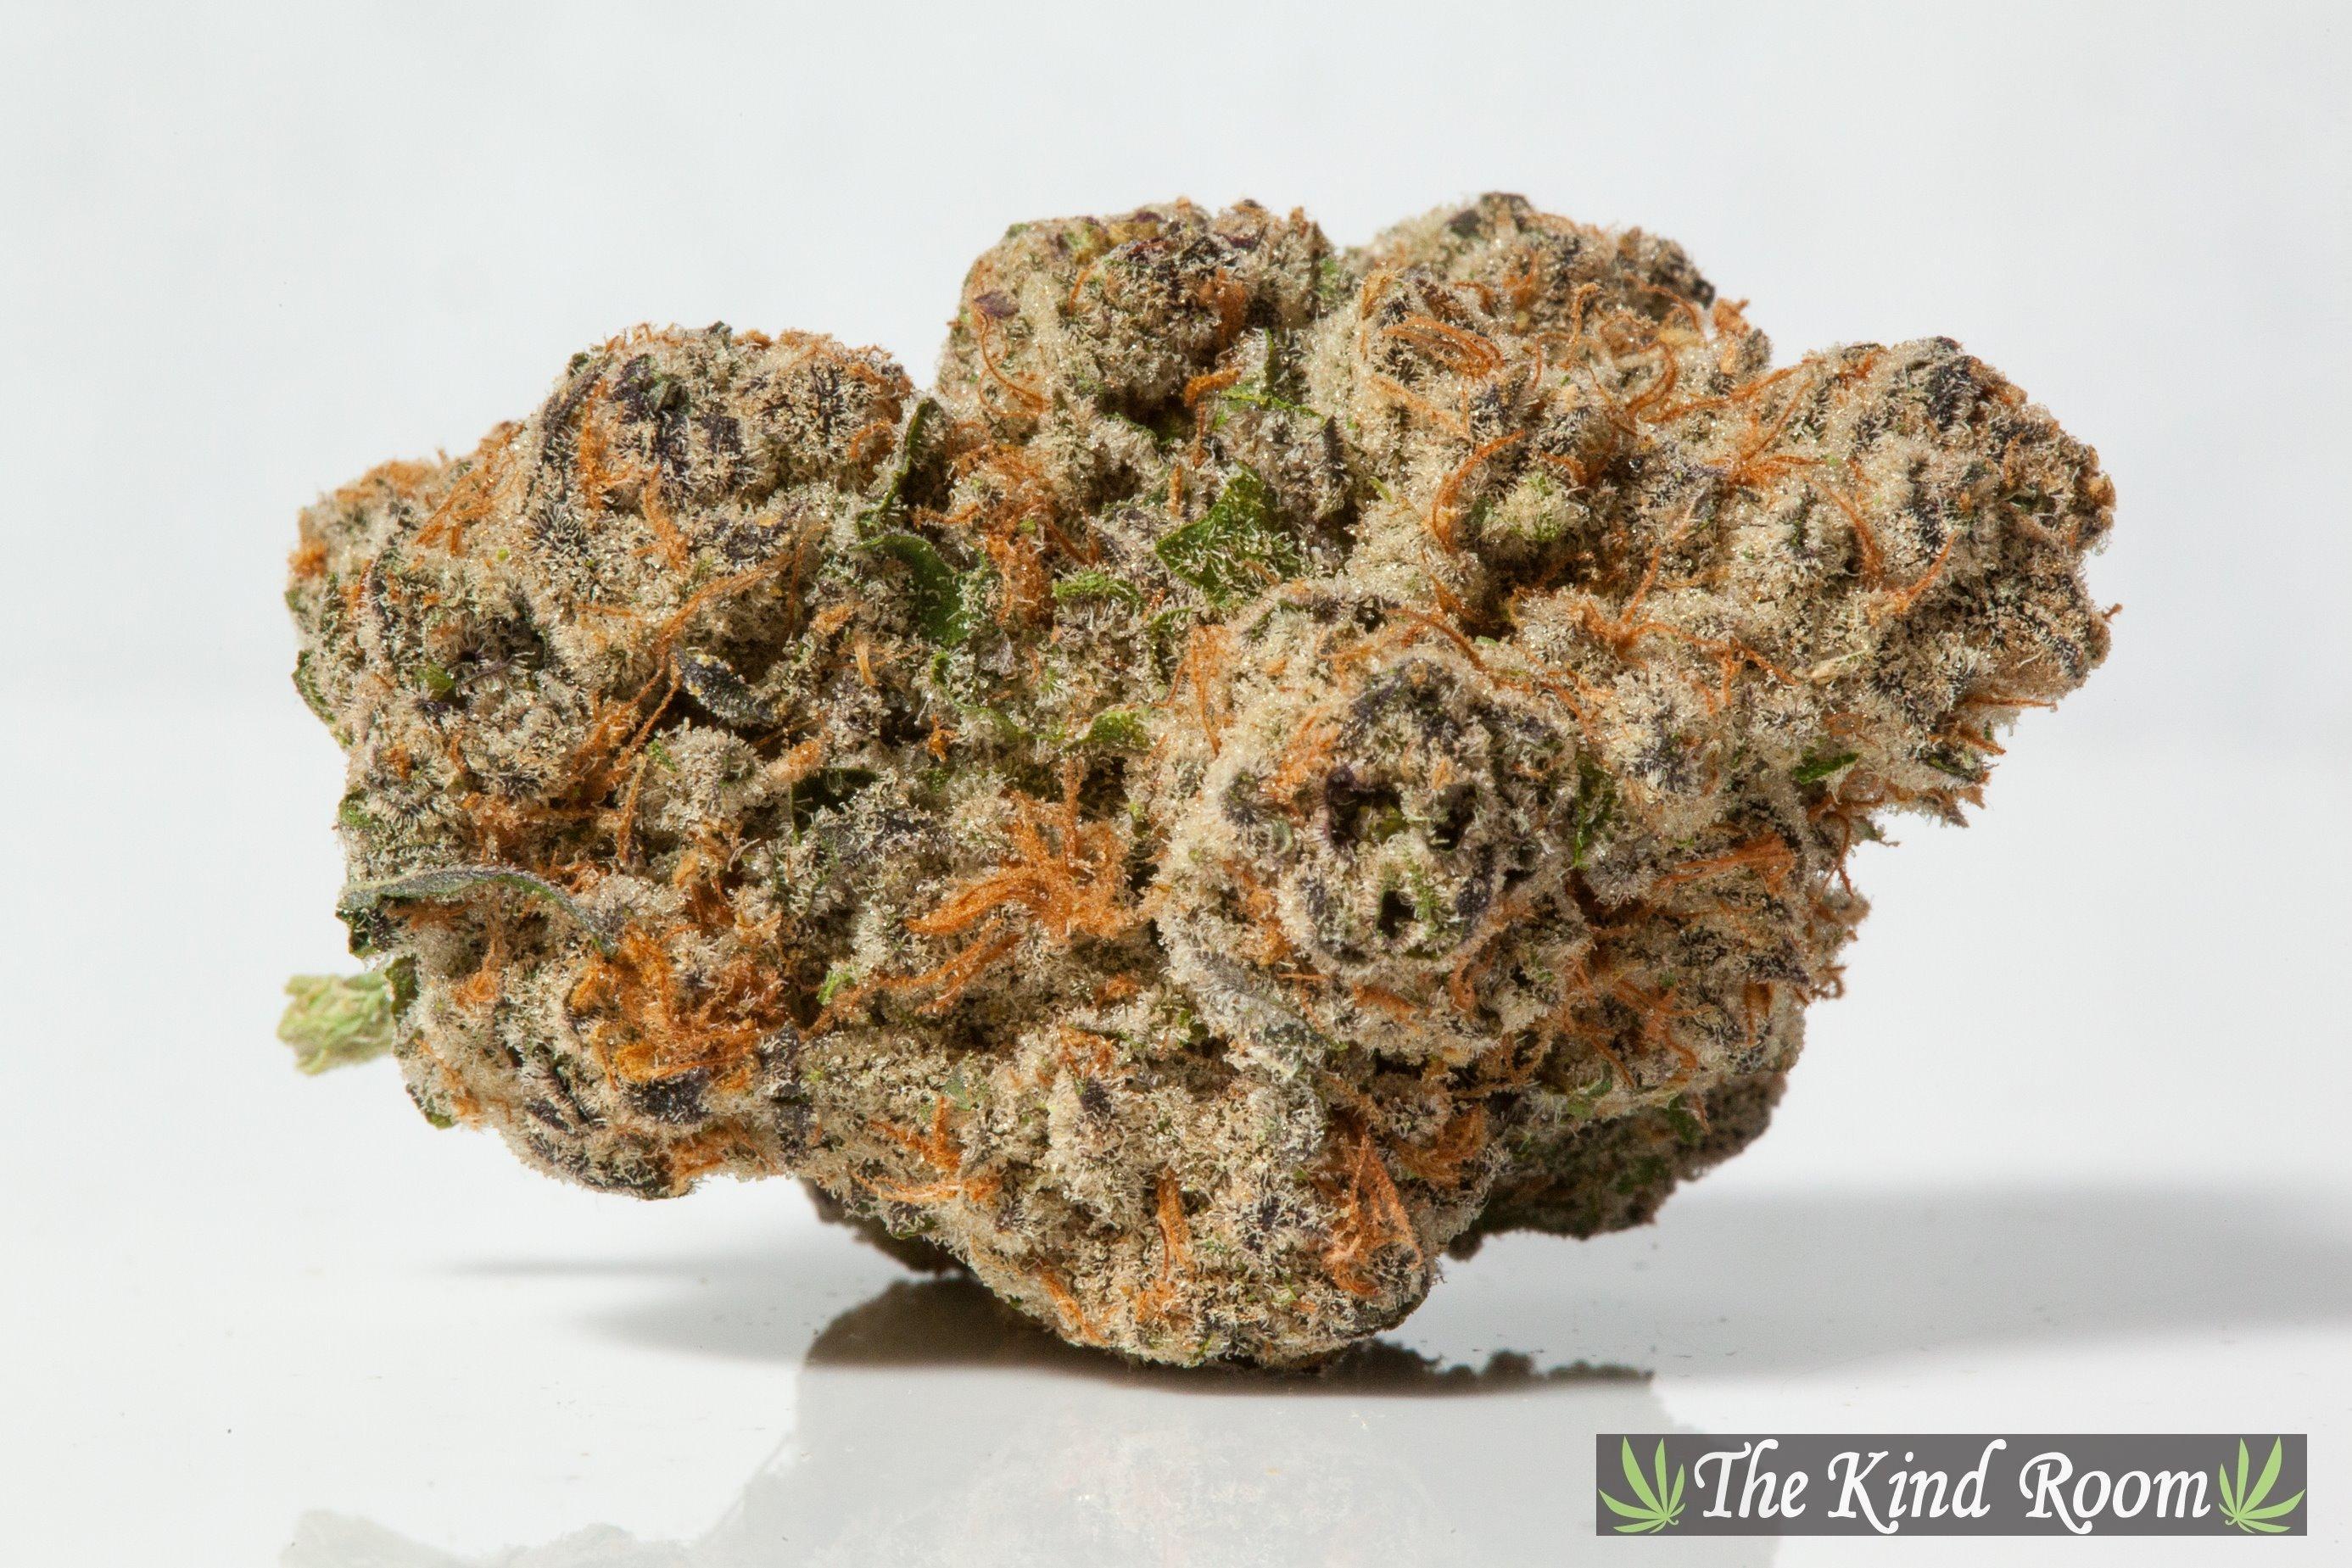 The Kind Room - Recreational | Medical - Cannabis Dispensary image 1